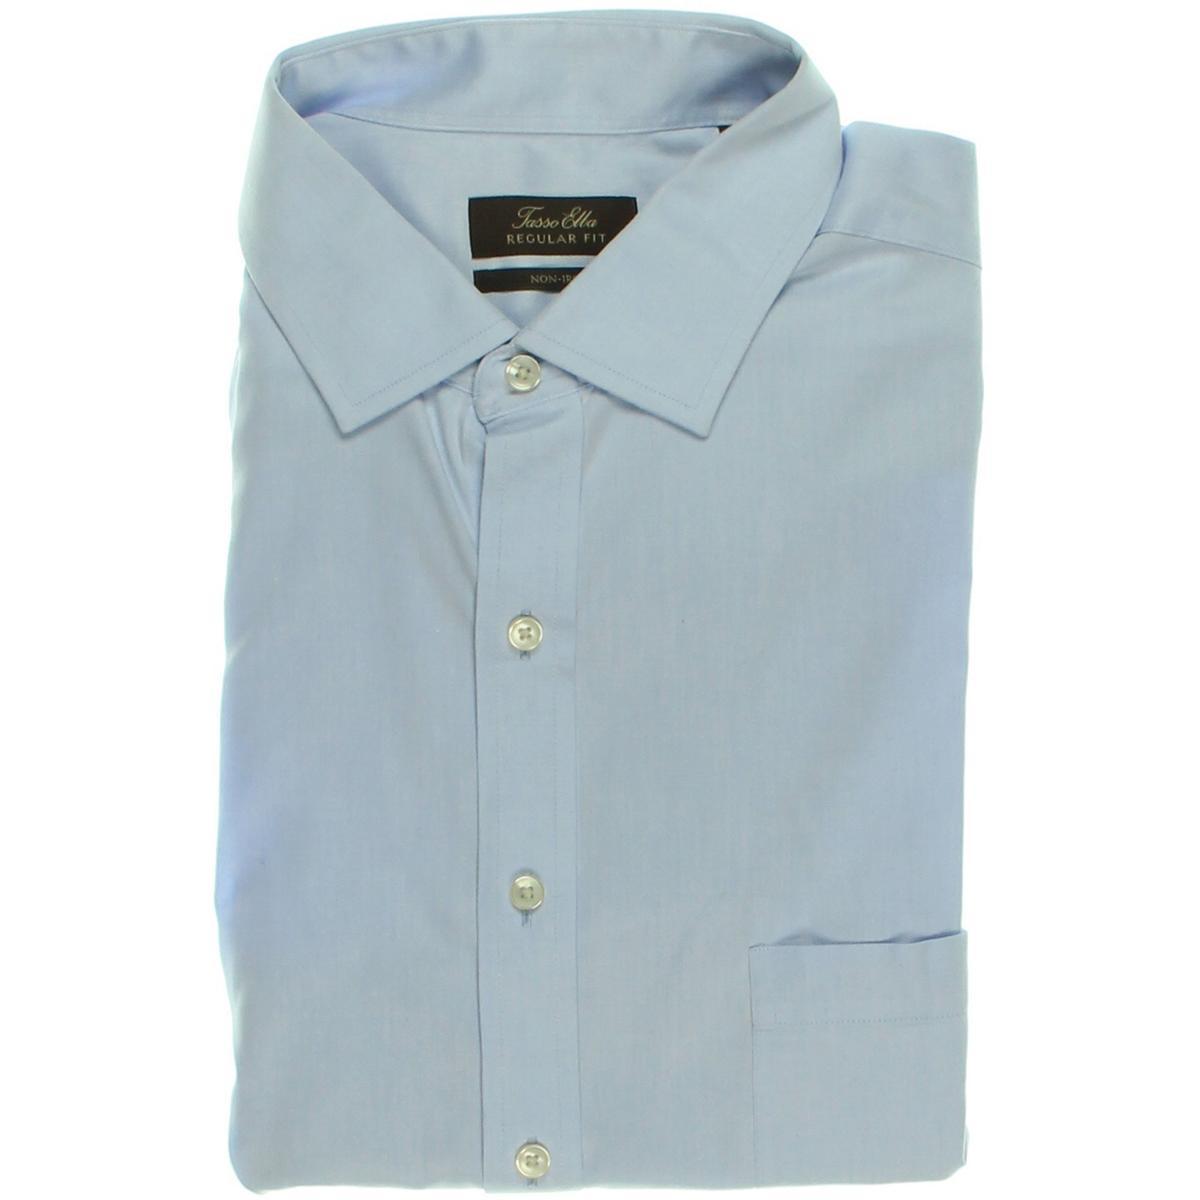 Tasso elba 2832 mens tab collar french cuff button down for Pin collar shirt double cuff